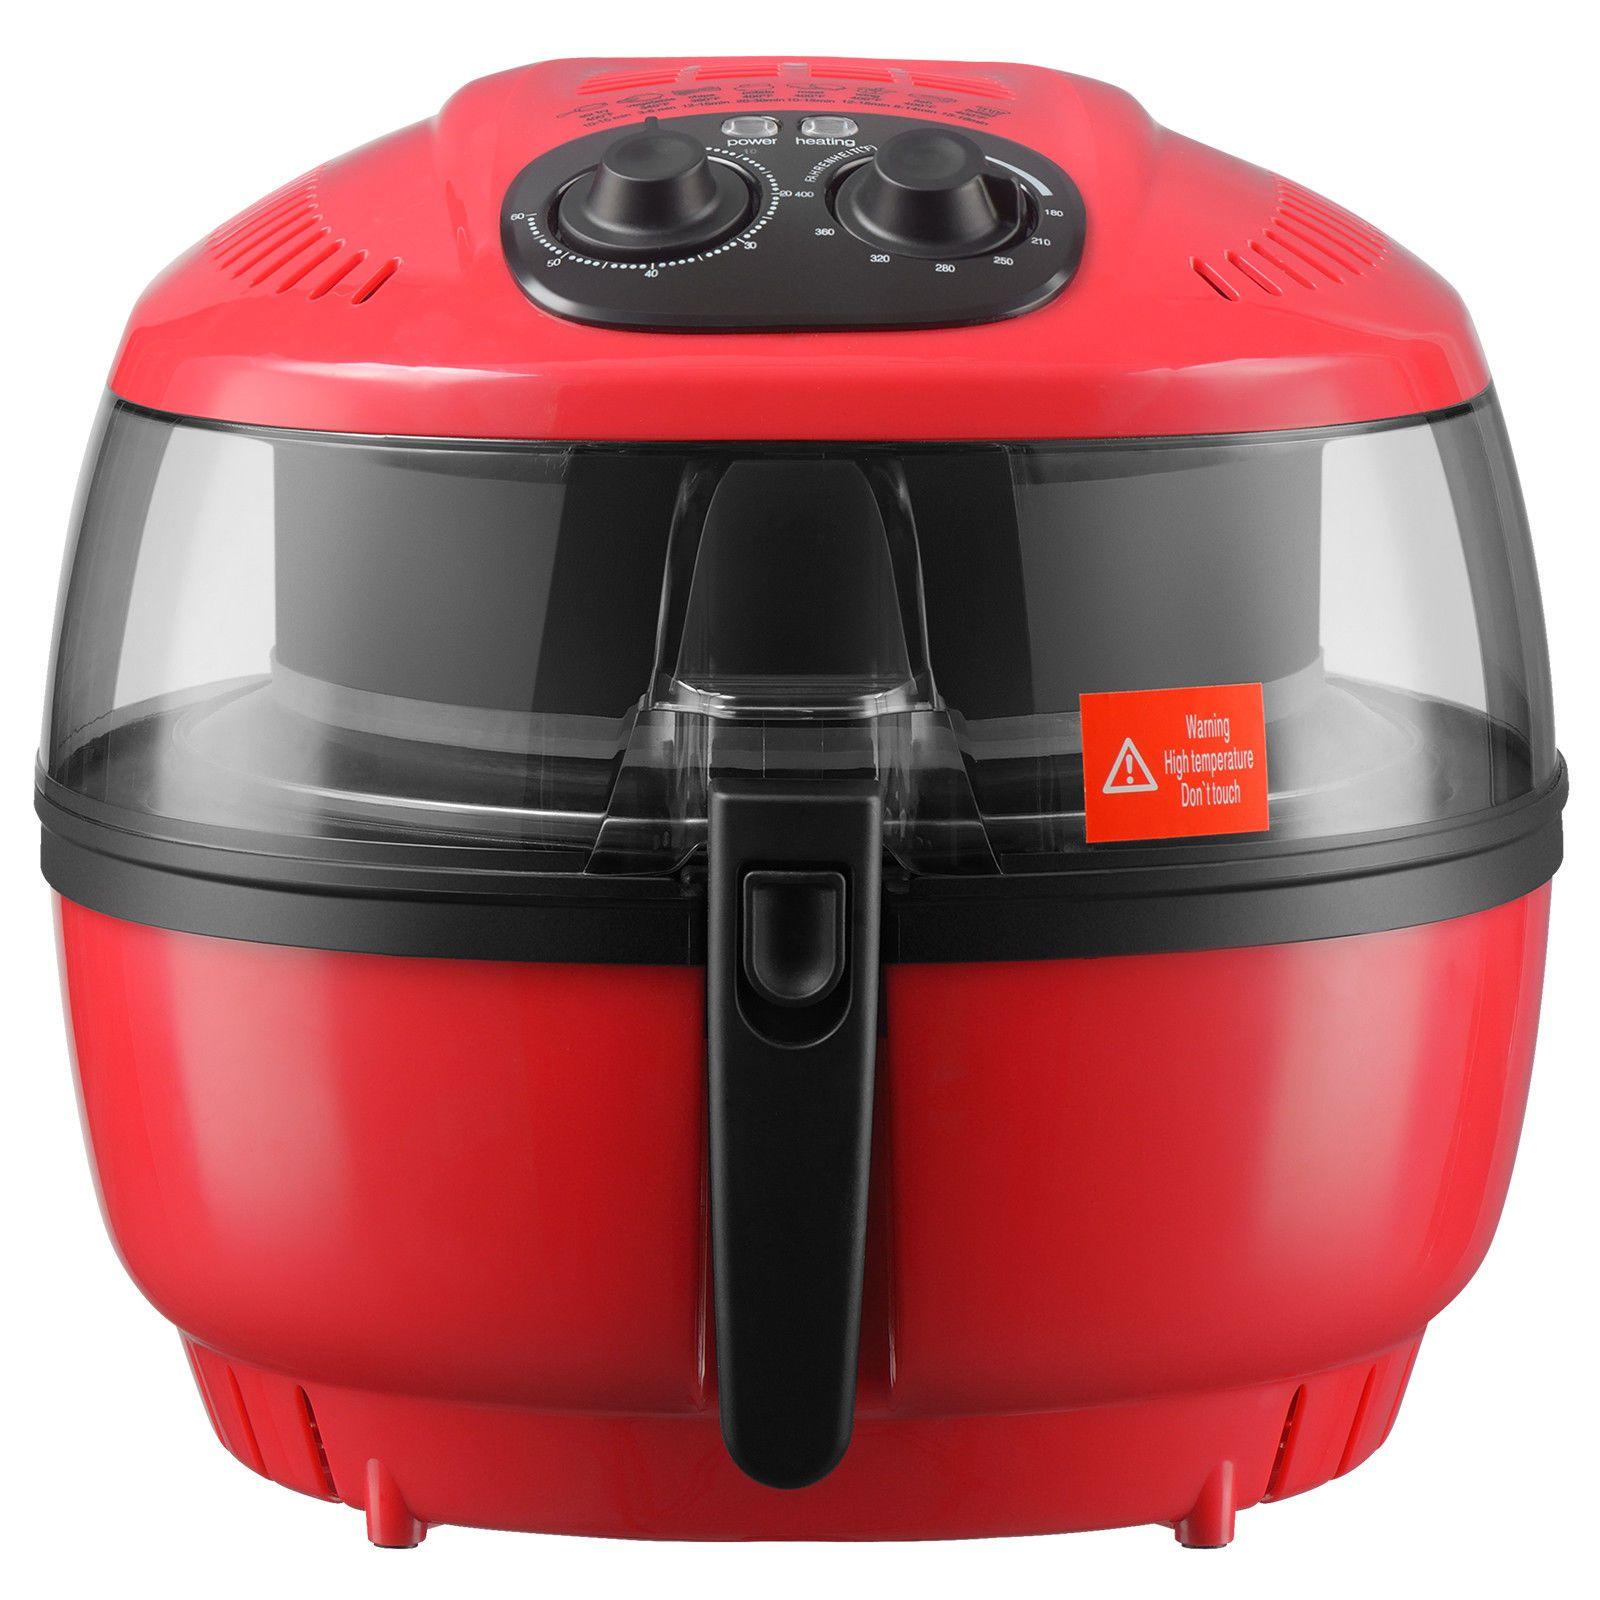 10QT Digital Electric Air Fryer OilLess Griller Calorie